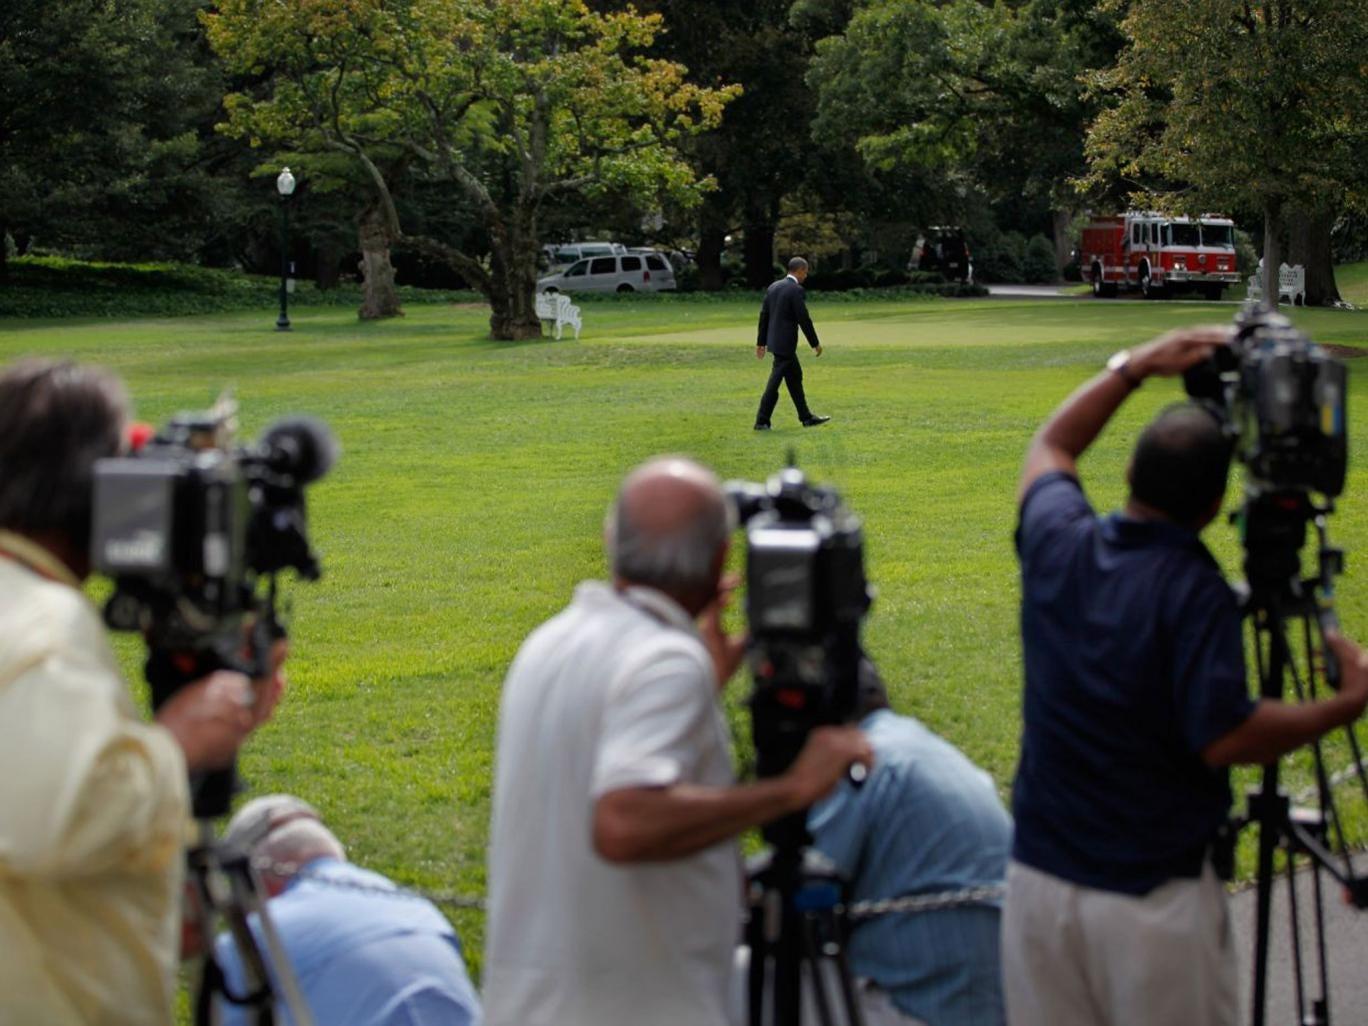 Free press? Cameras follow Barack Obama at the White House